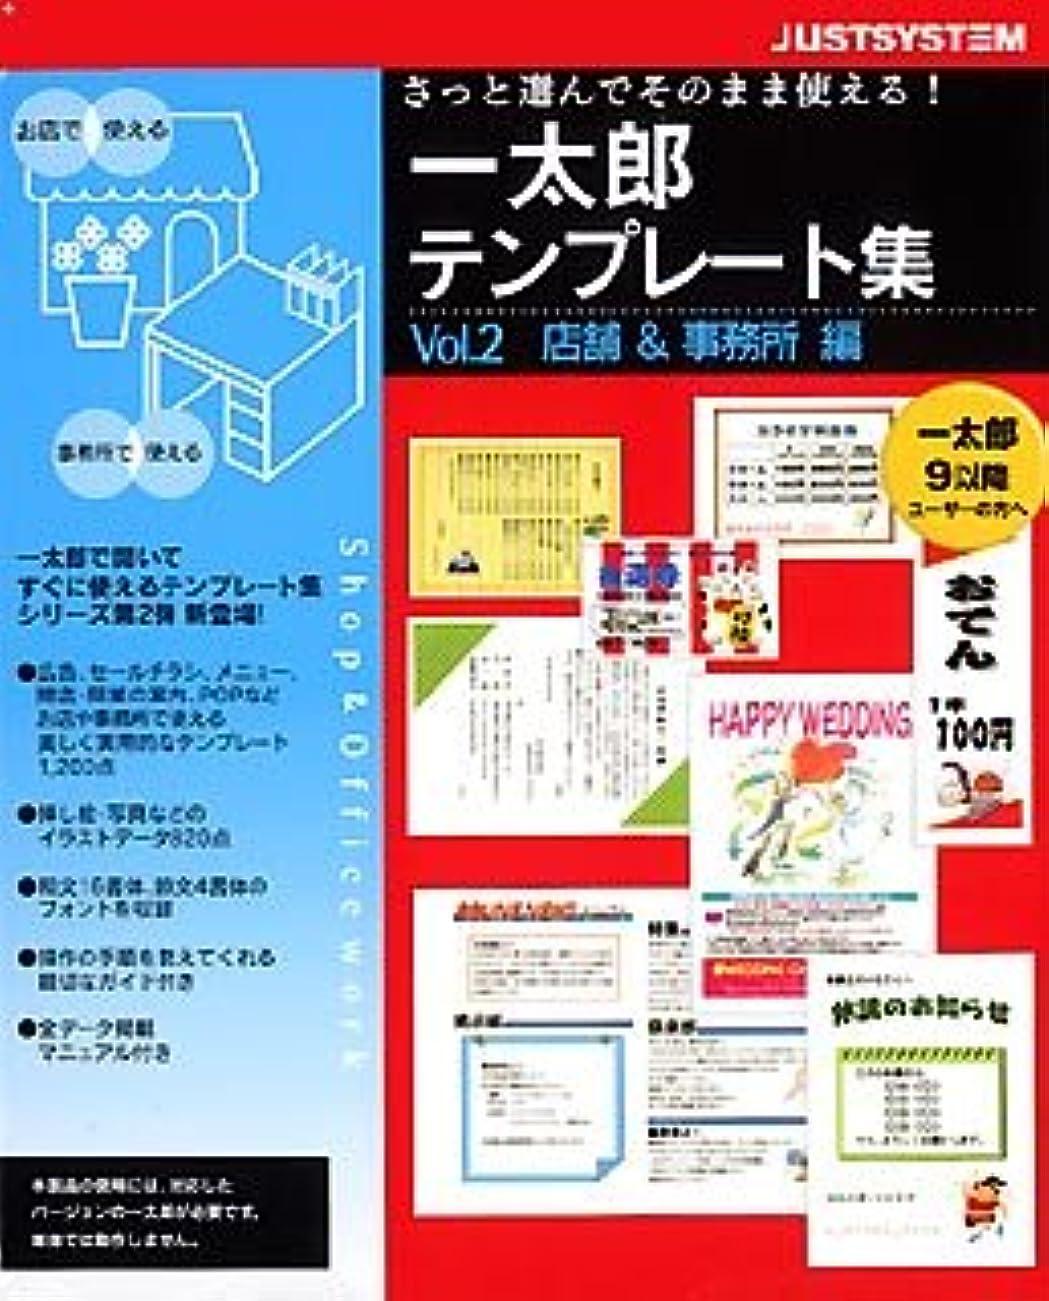 急性進行中告発者一太郎テンプレート集 Vol.2 店舗&事務所編